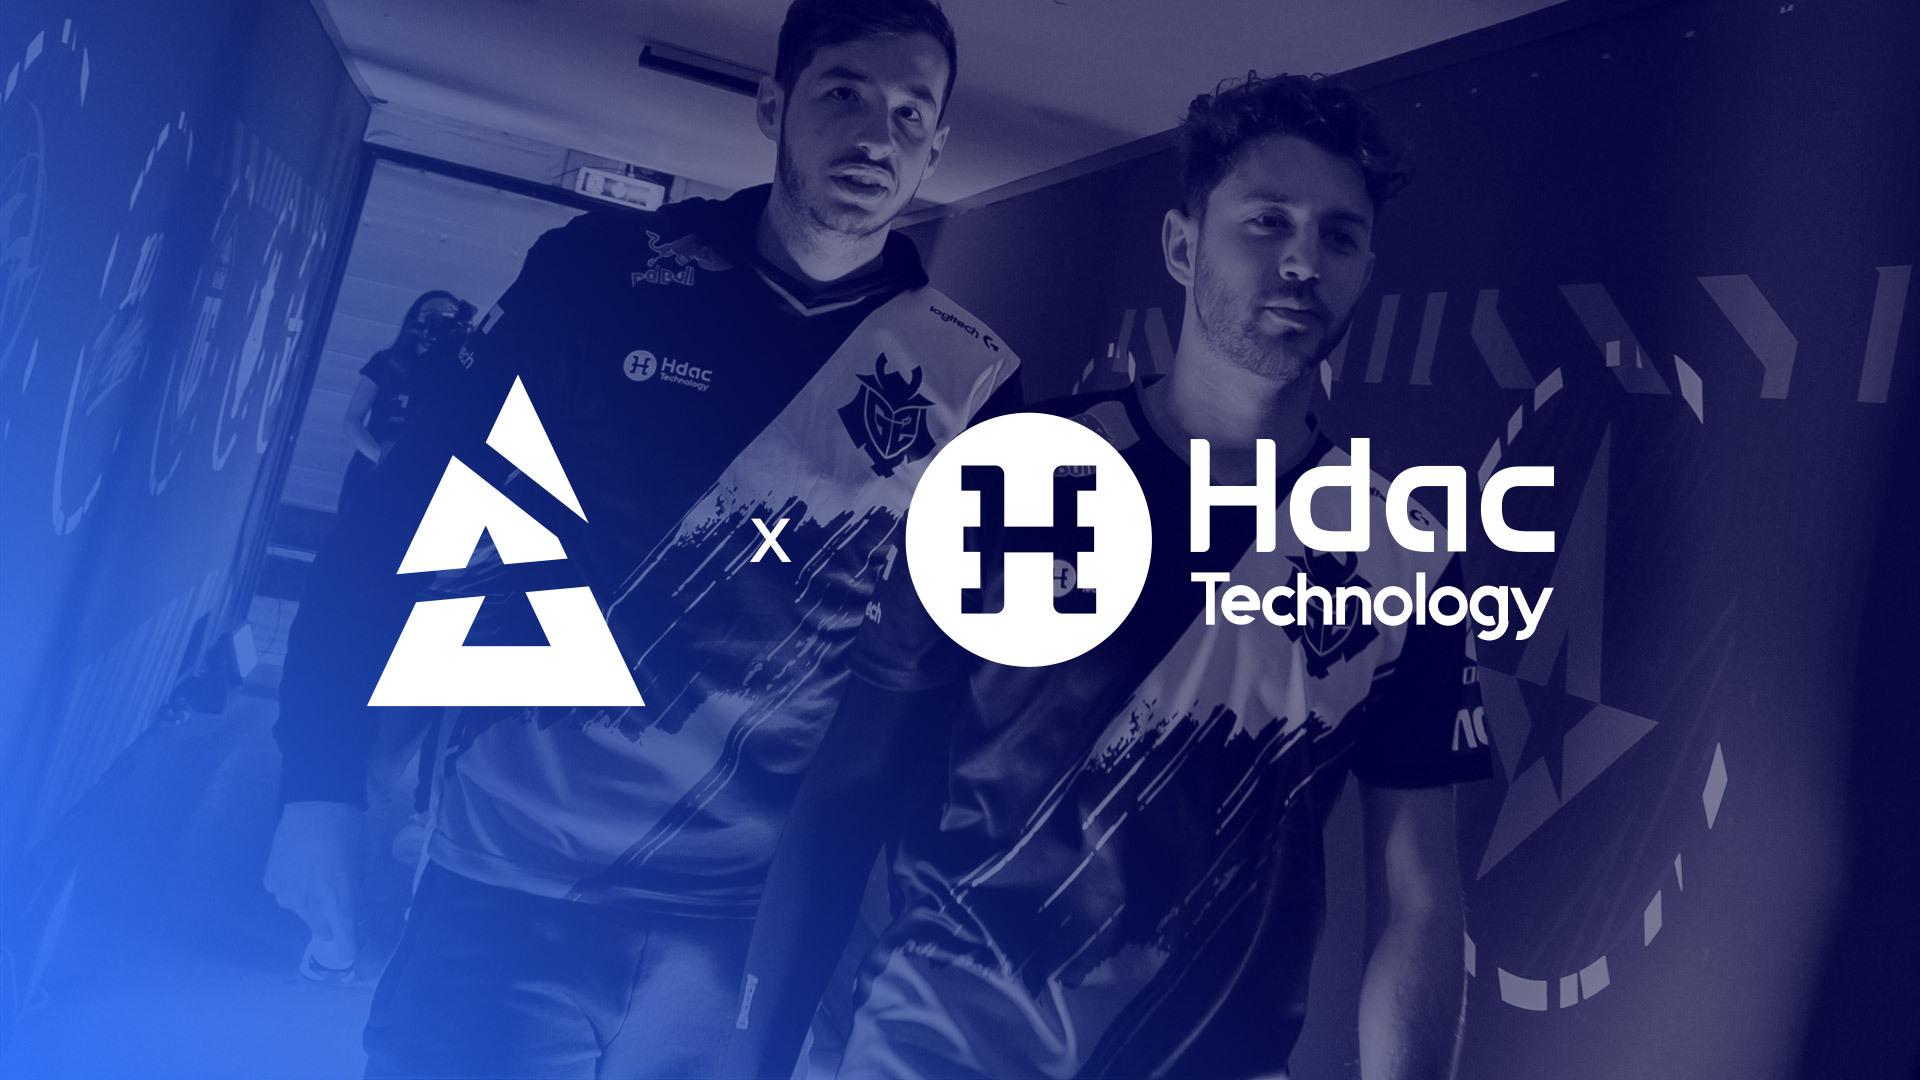 BLAST Premier announces partnership with BlockChain Company Hdac